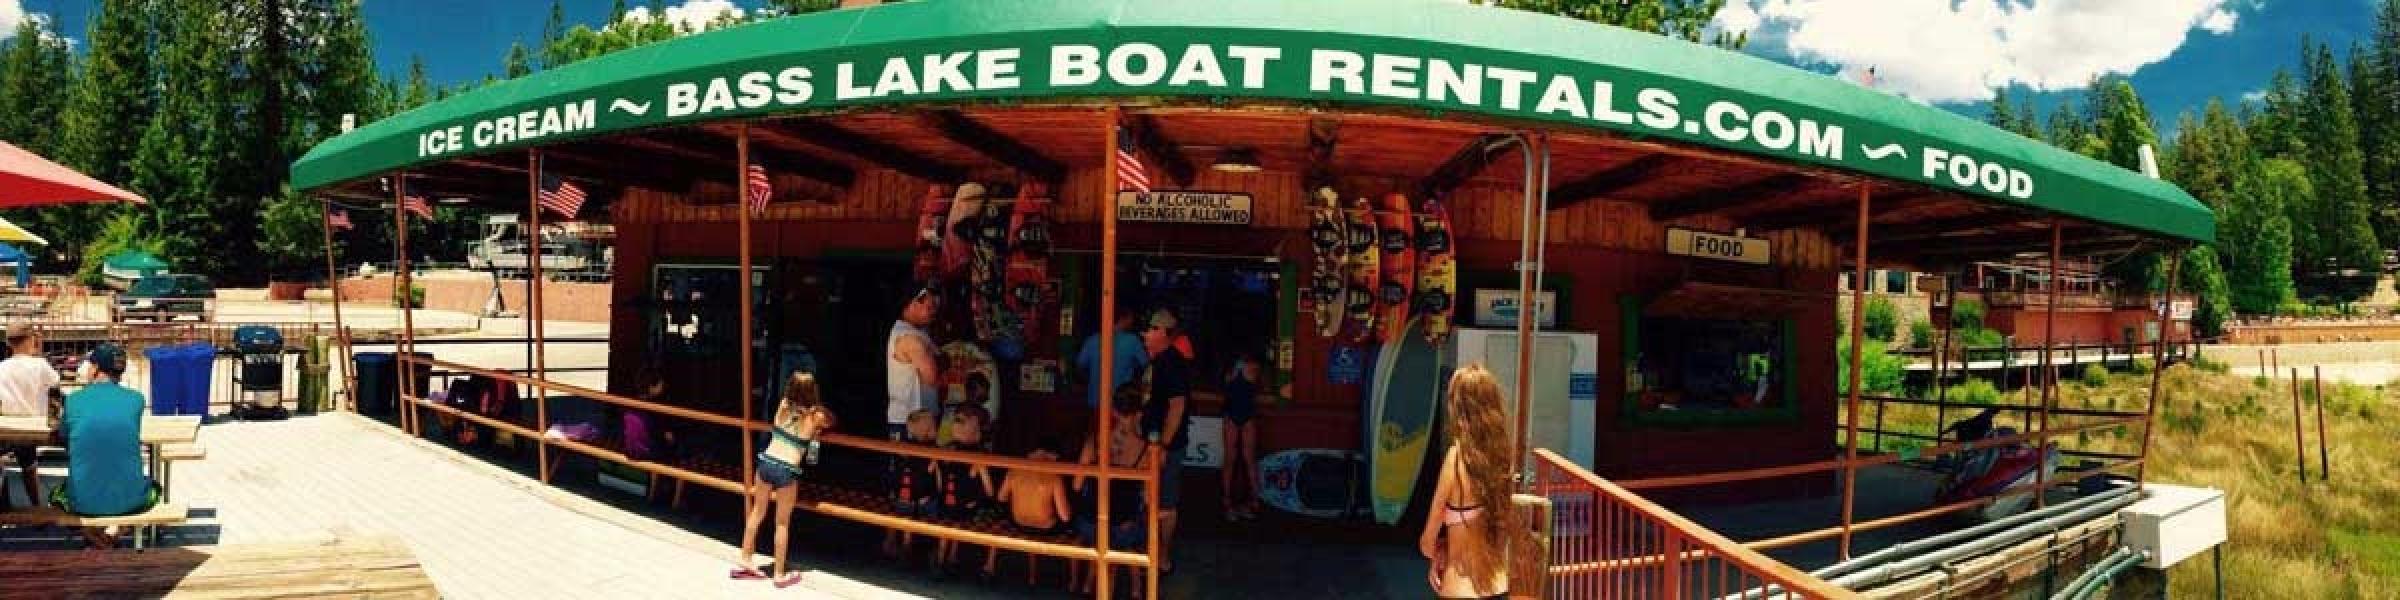 2015-fish-eye-view-bass-lake-ca-marina-watersports-slider